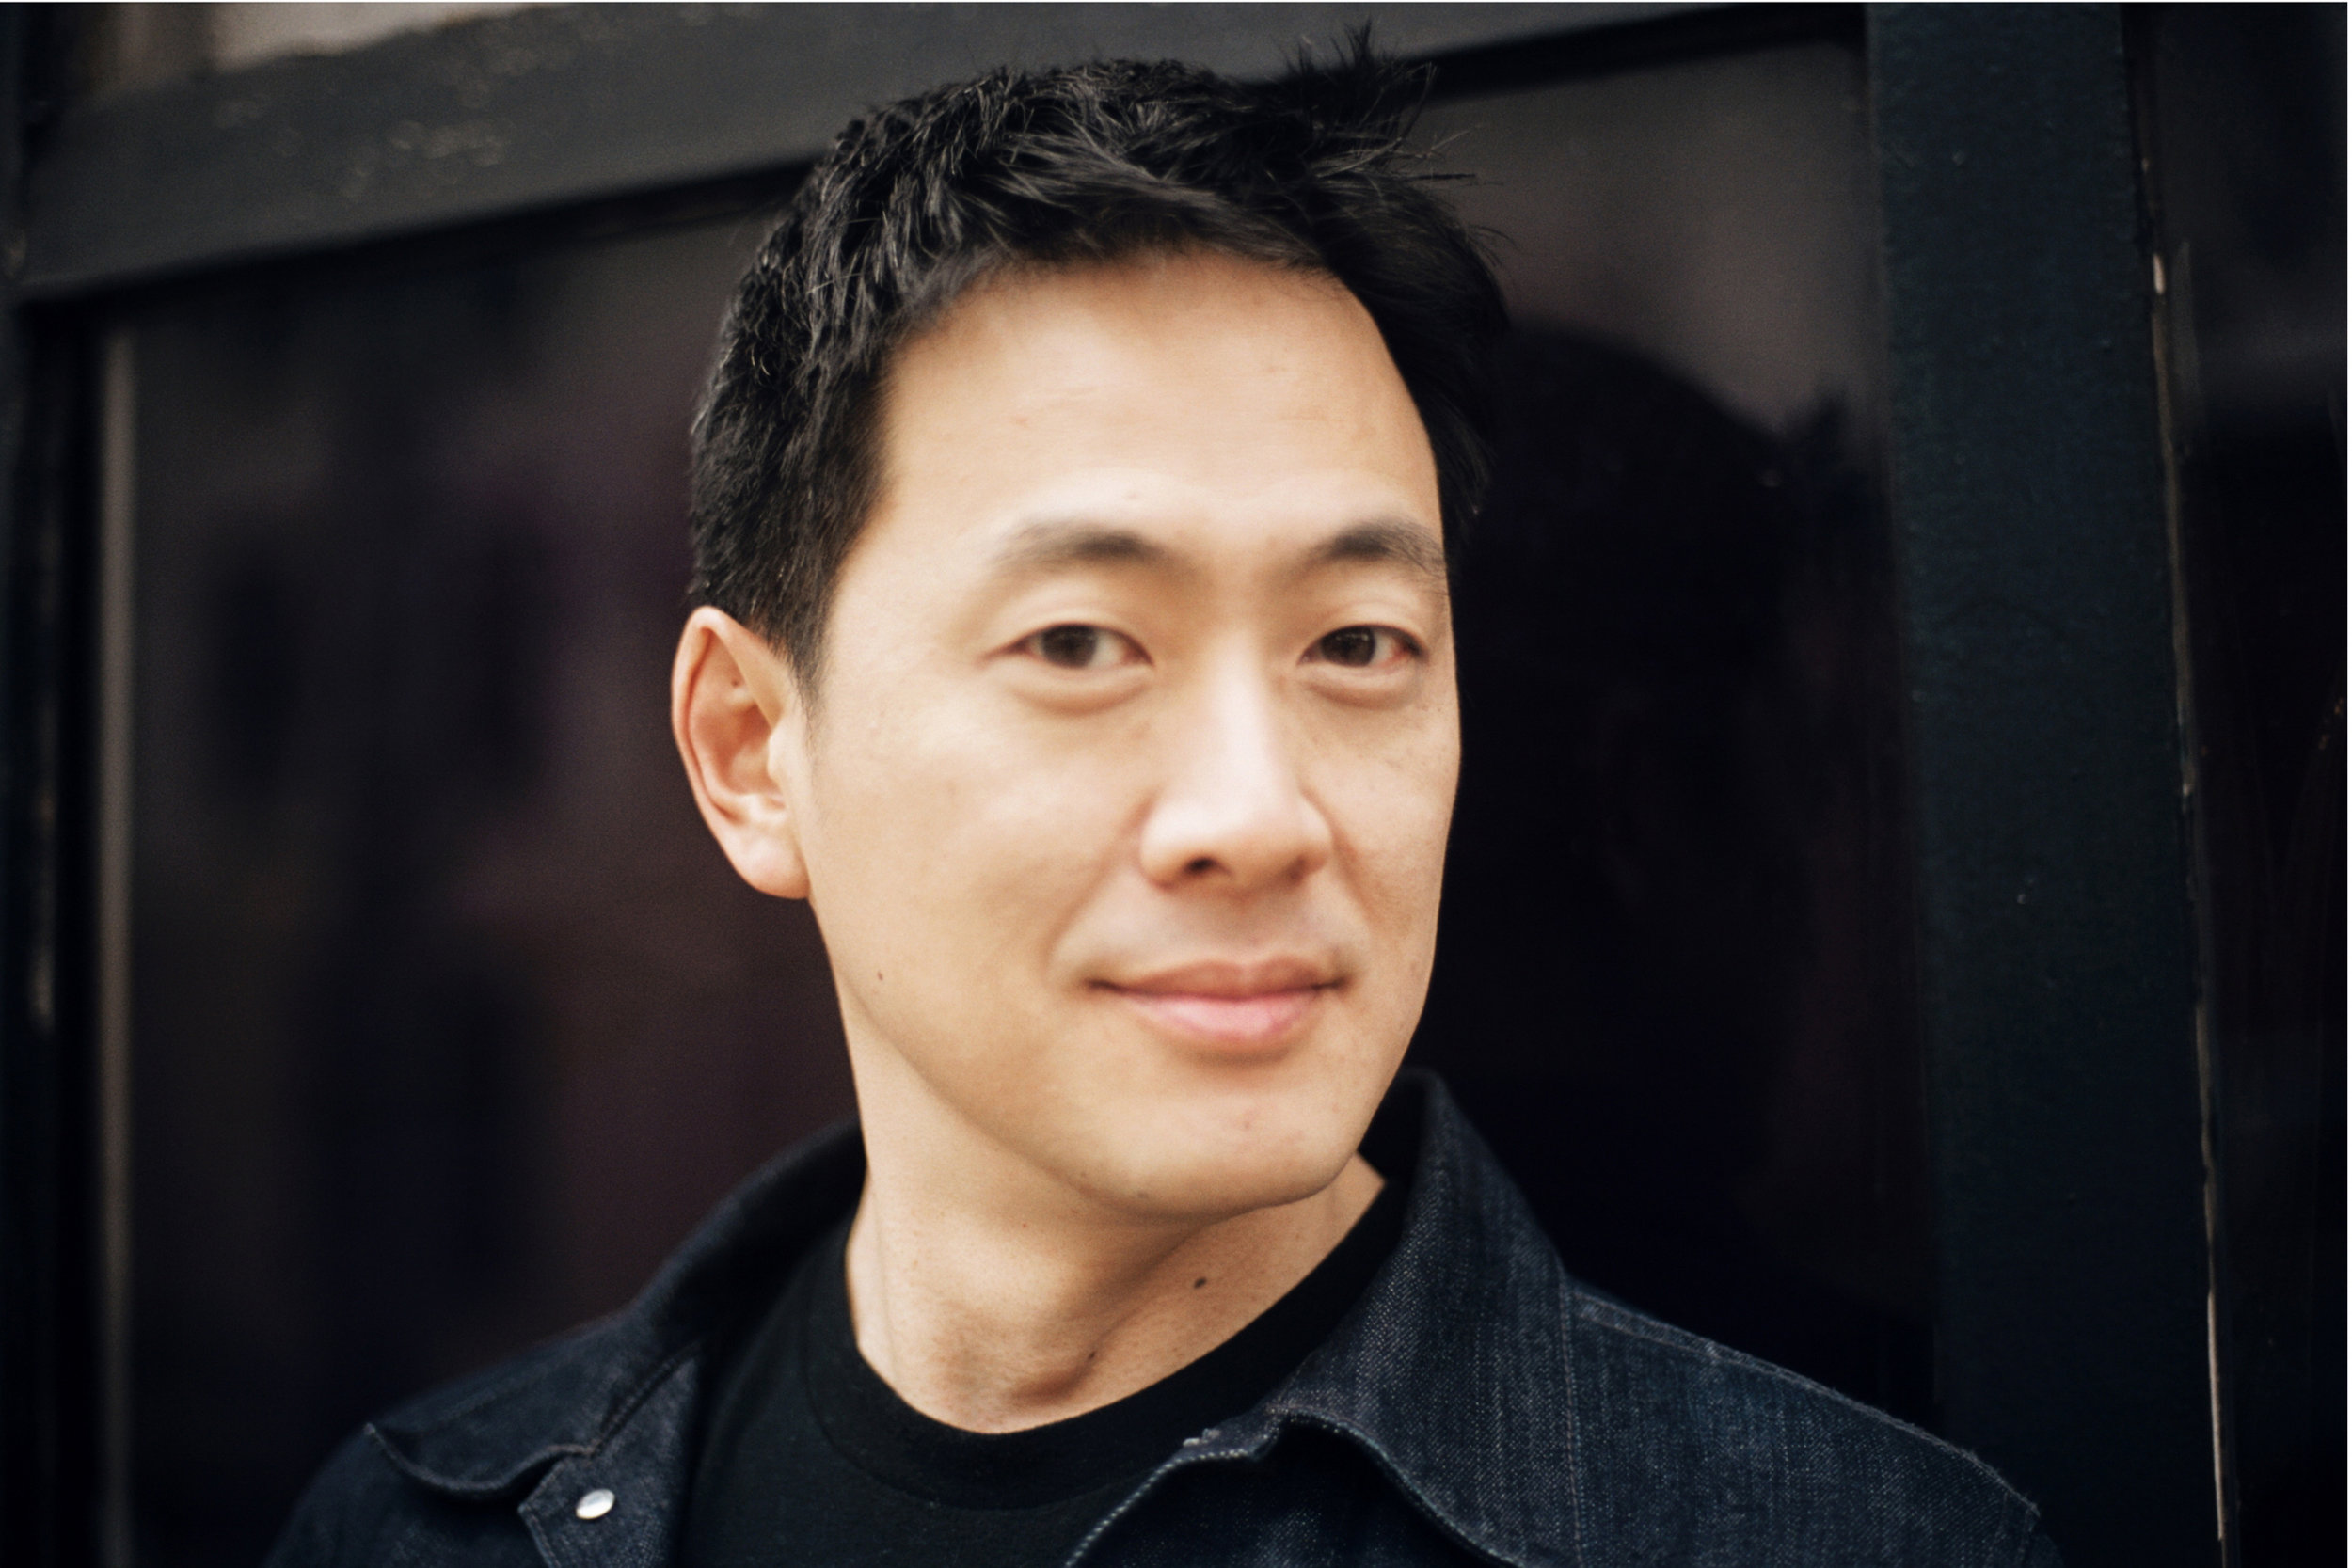 Paul juhn - Writer, Producer